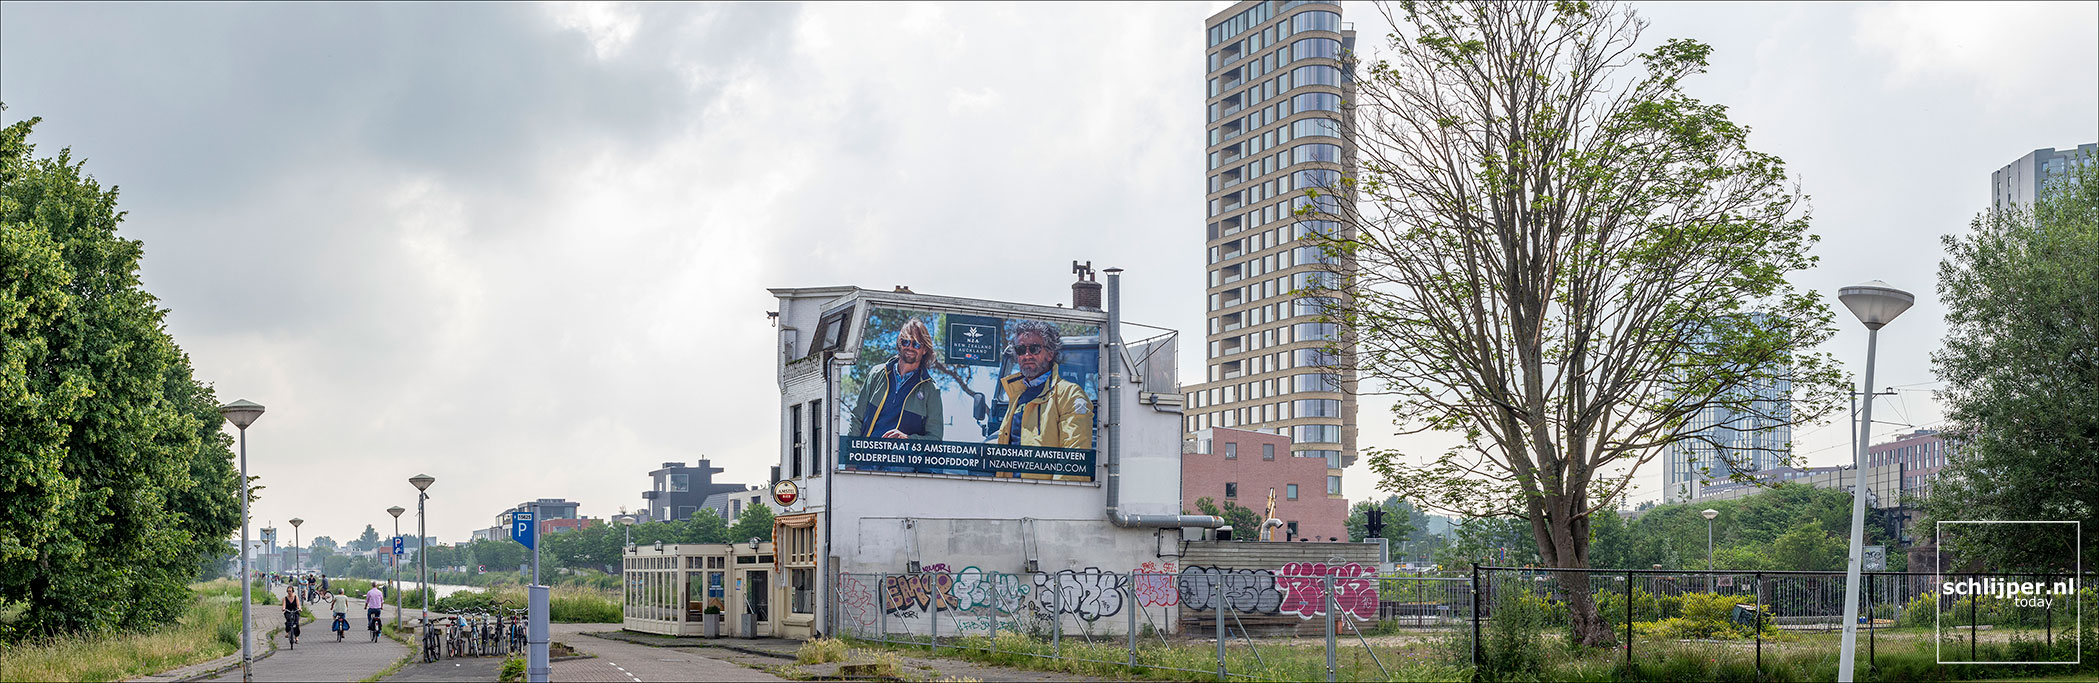 Nederland, Amsterdam, 14 juni 2020